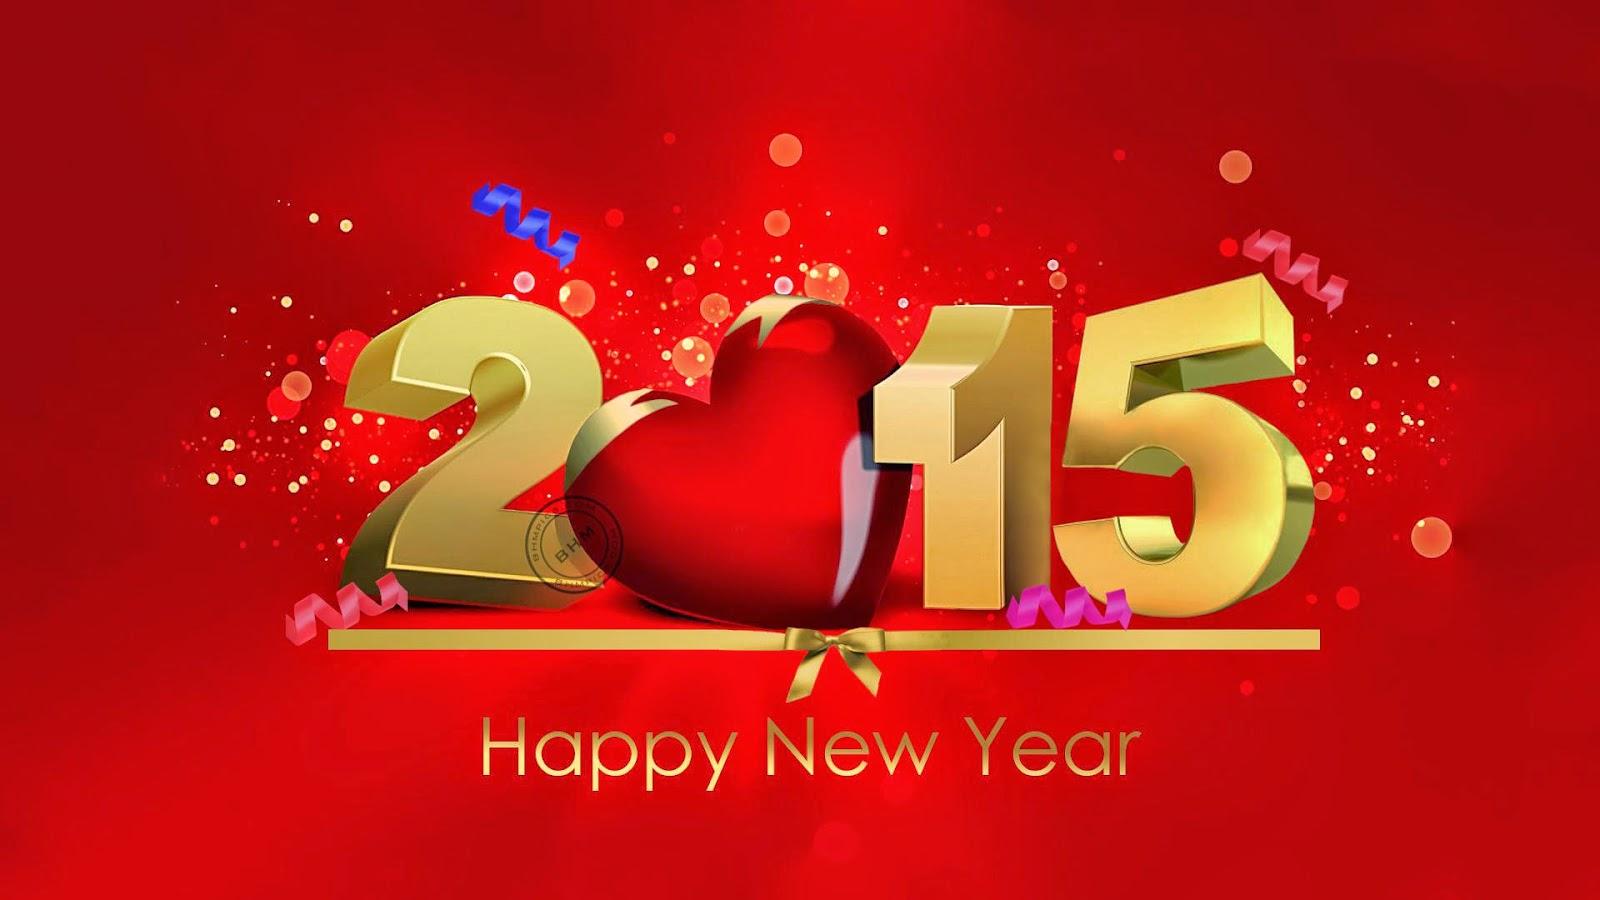 happy new year 2015 - #happynewyear2015 #heart #gold #redbackground